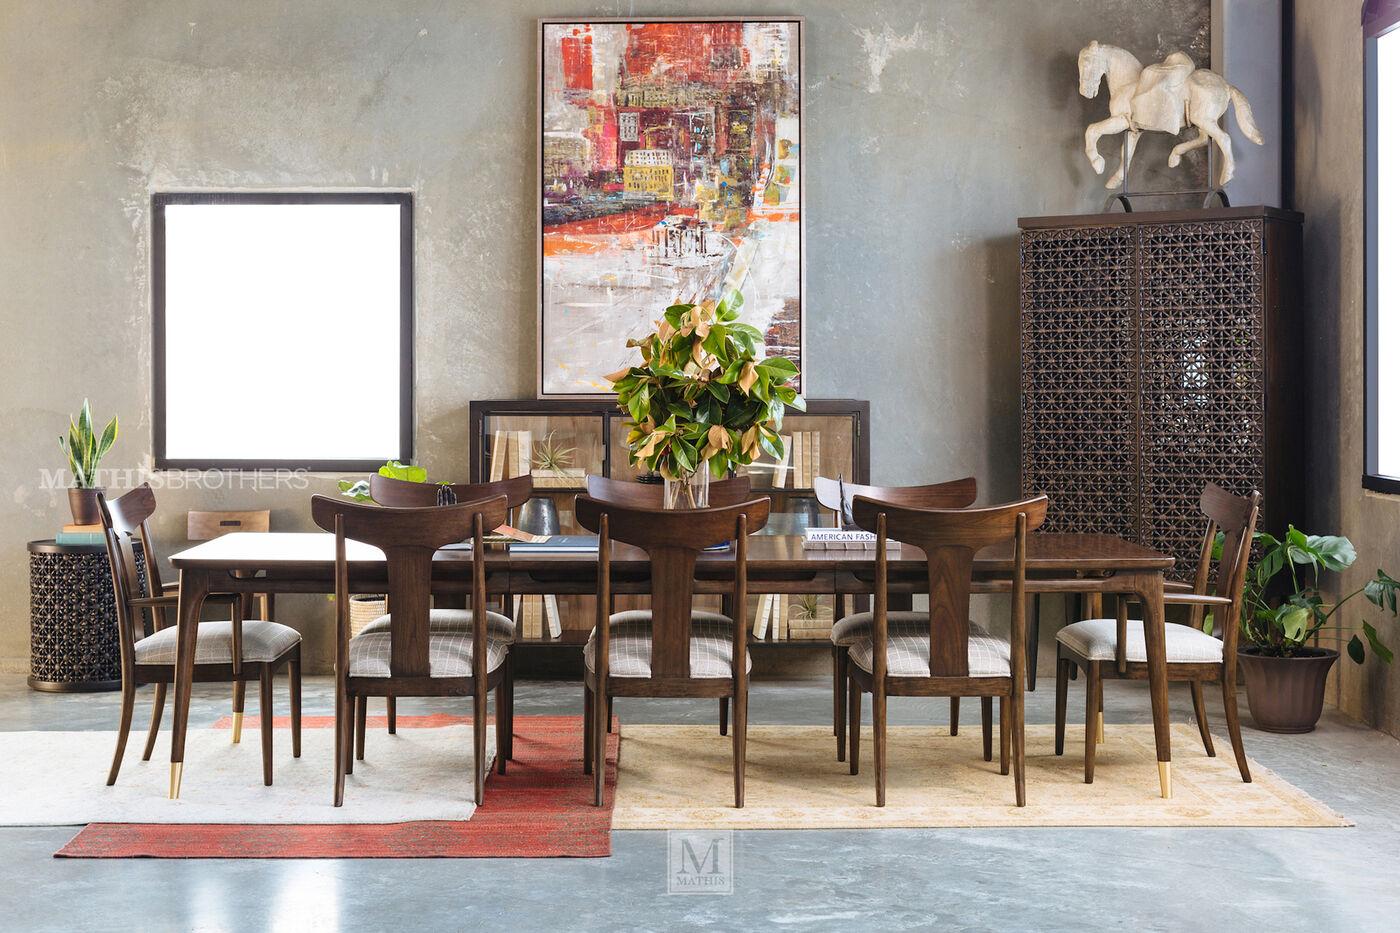 thomasville ellen degeneres westwood walnut rectangular dining thomasville ellen degeneres westwood walnut rectangular dining table